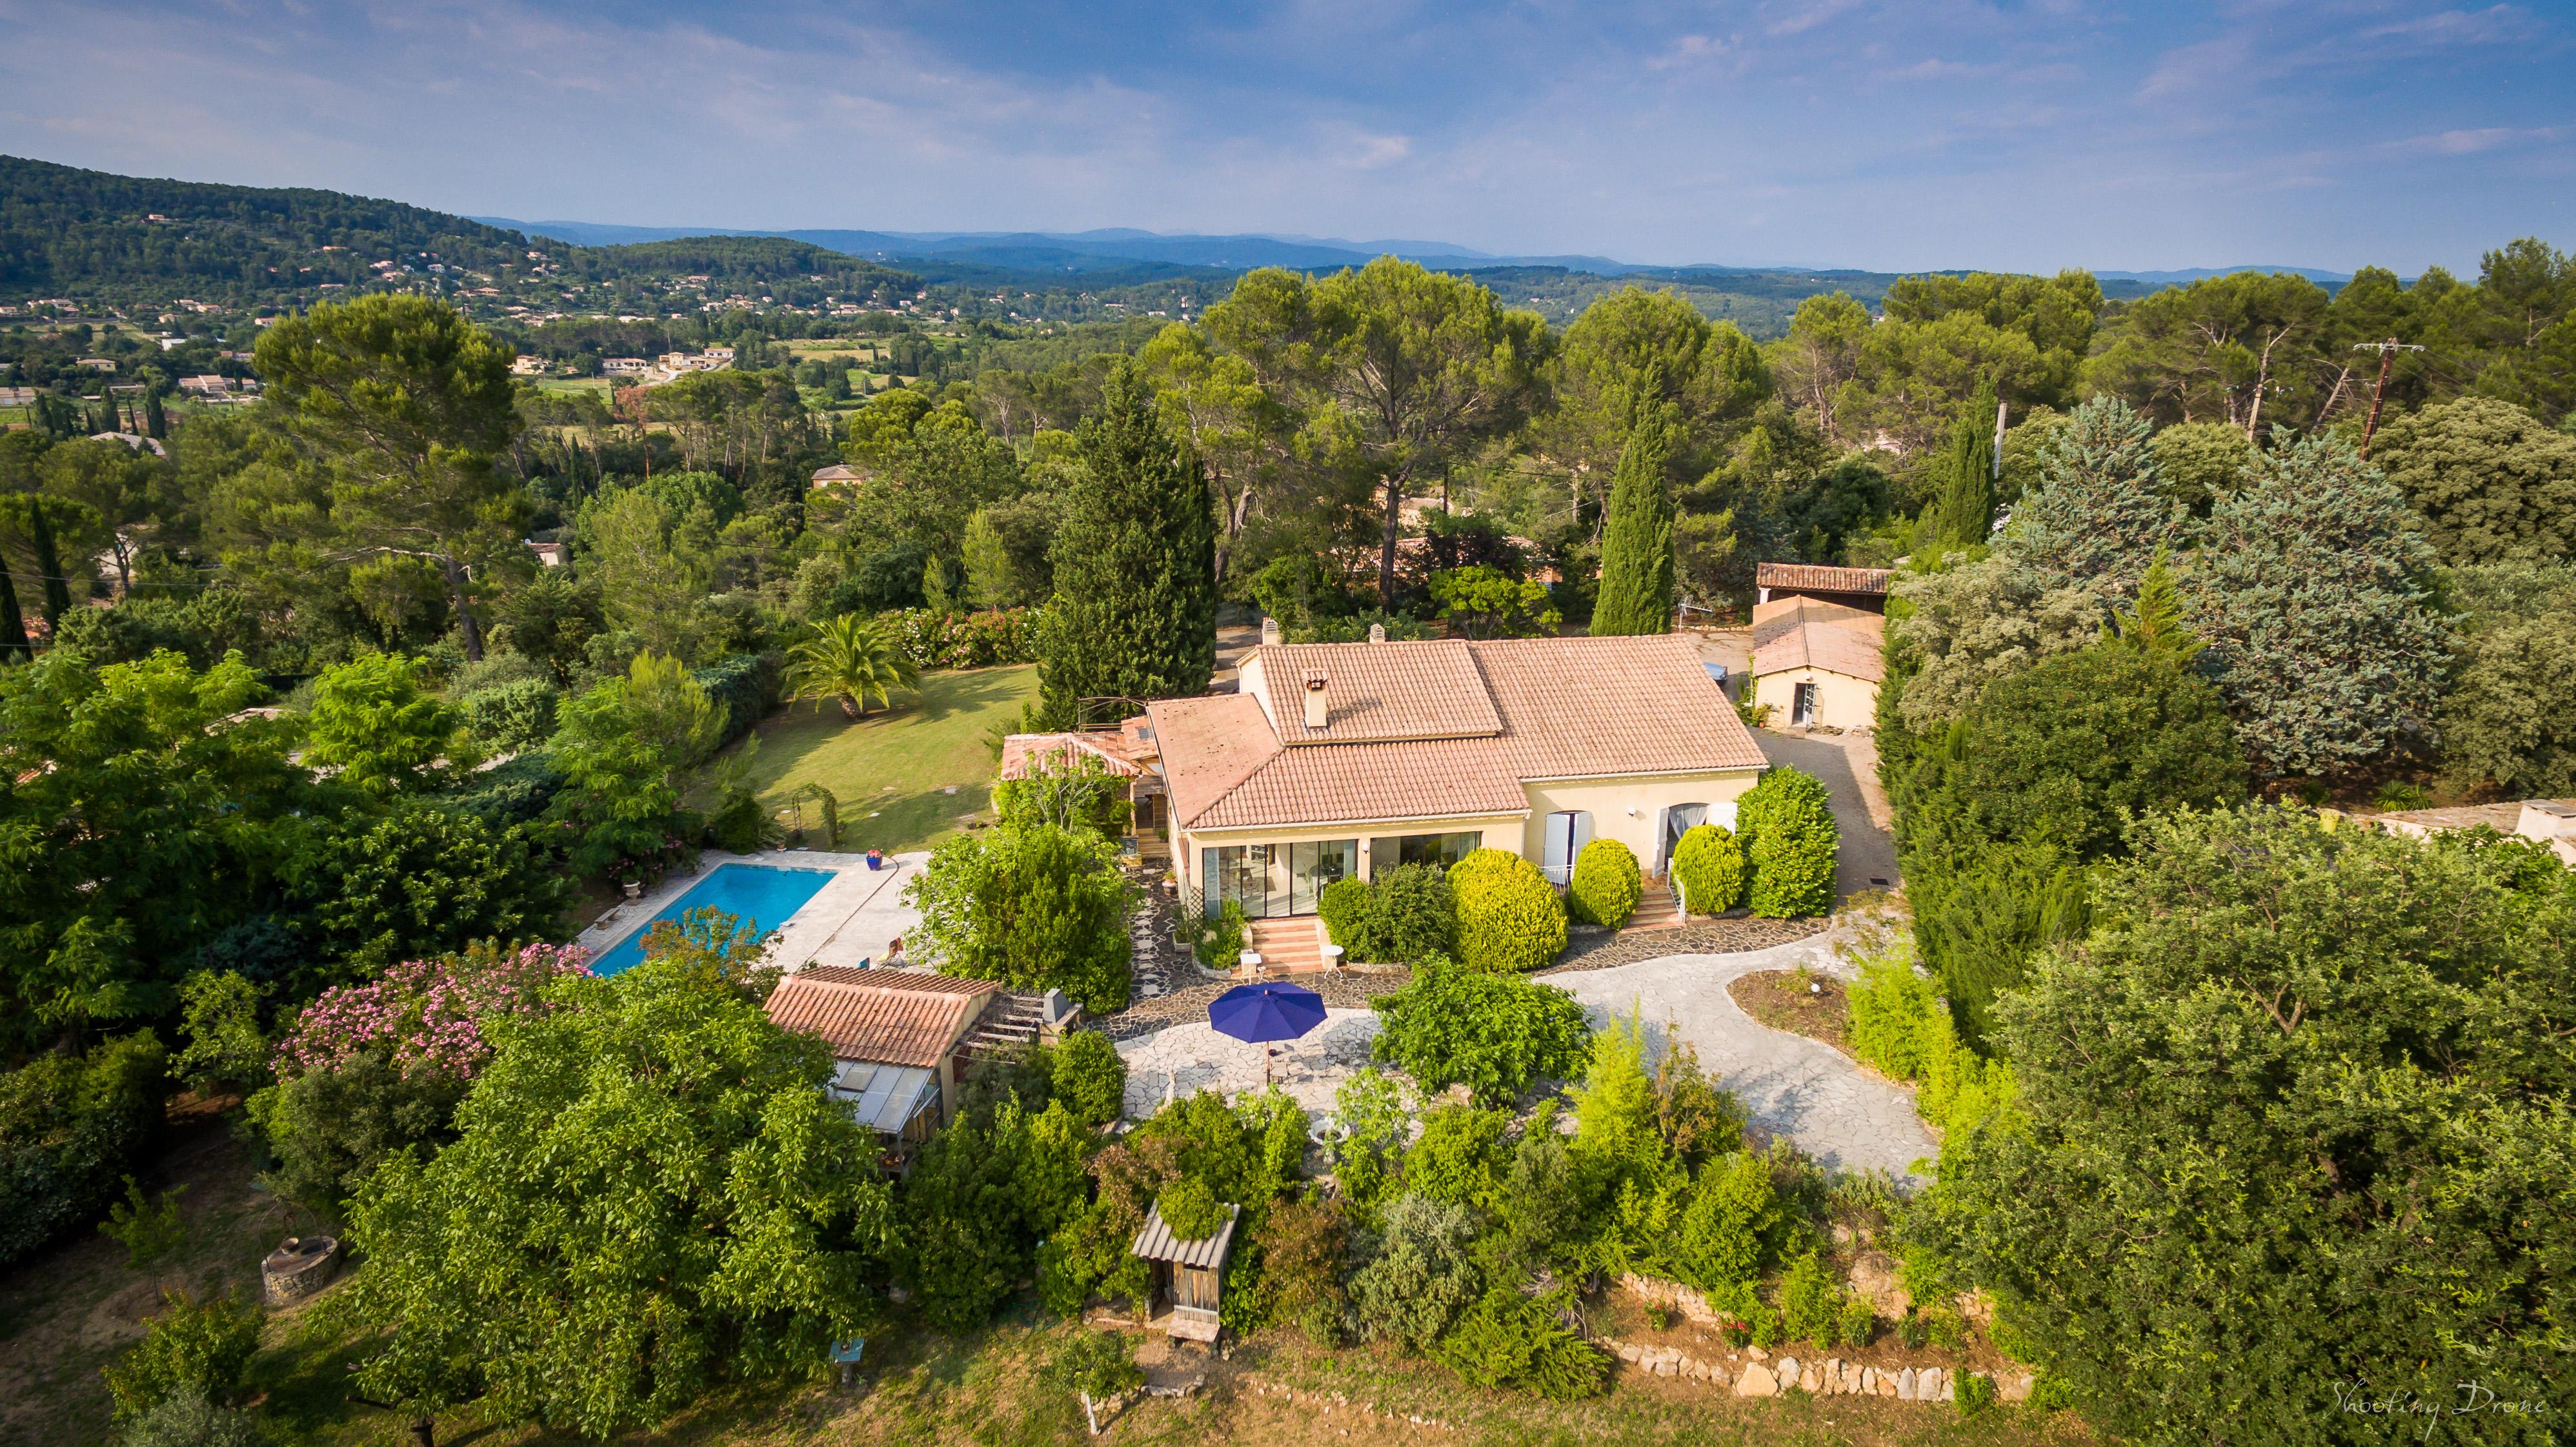 Hotes' Antic Provence - Richard Claudine